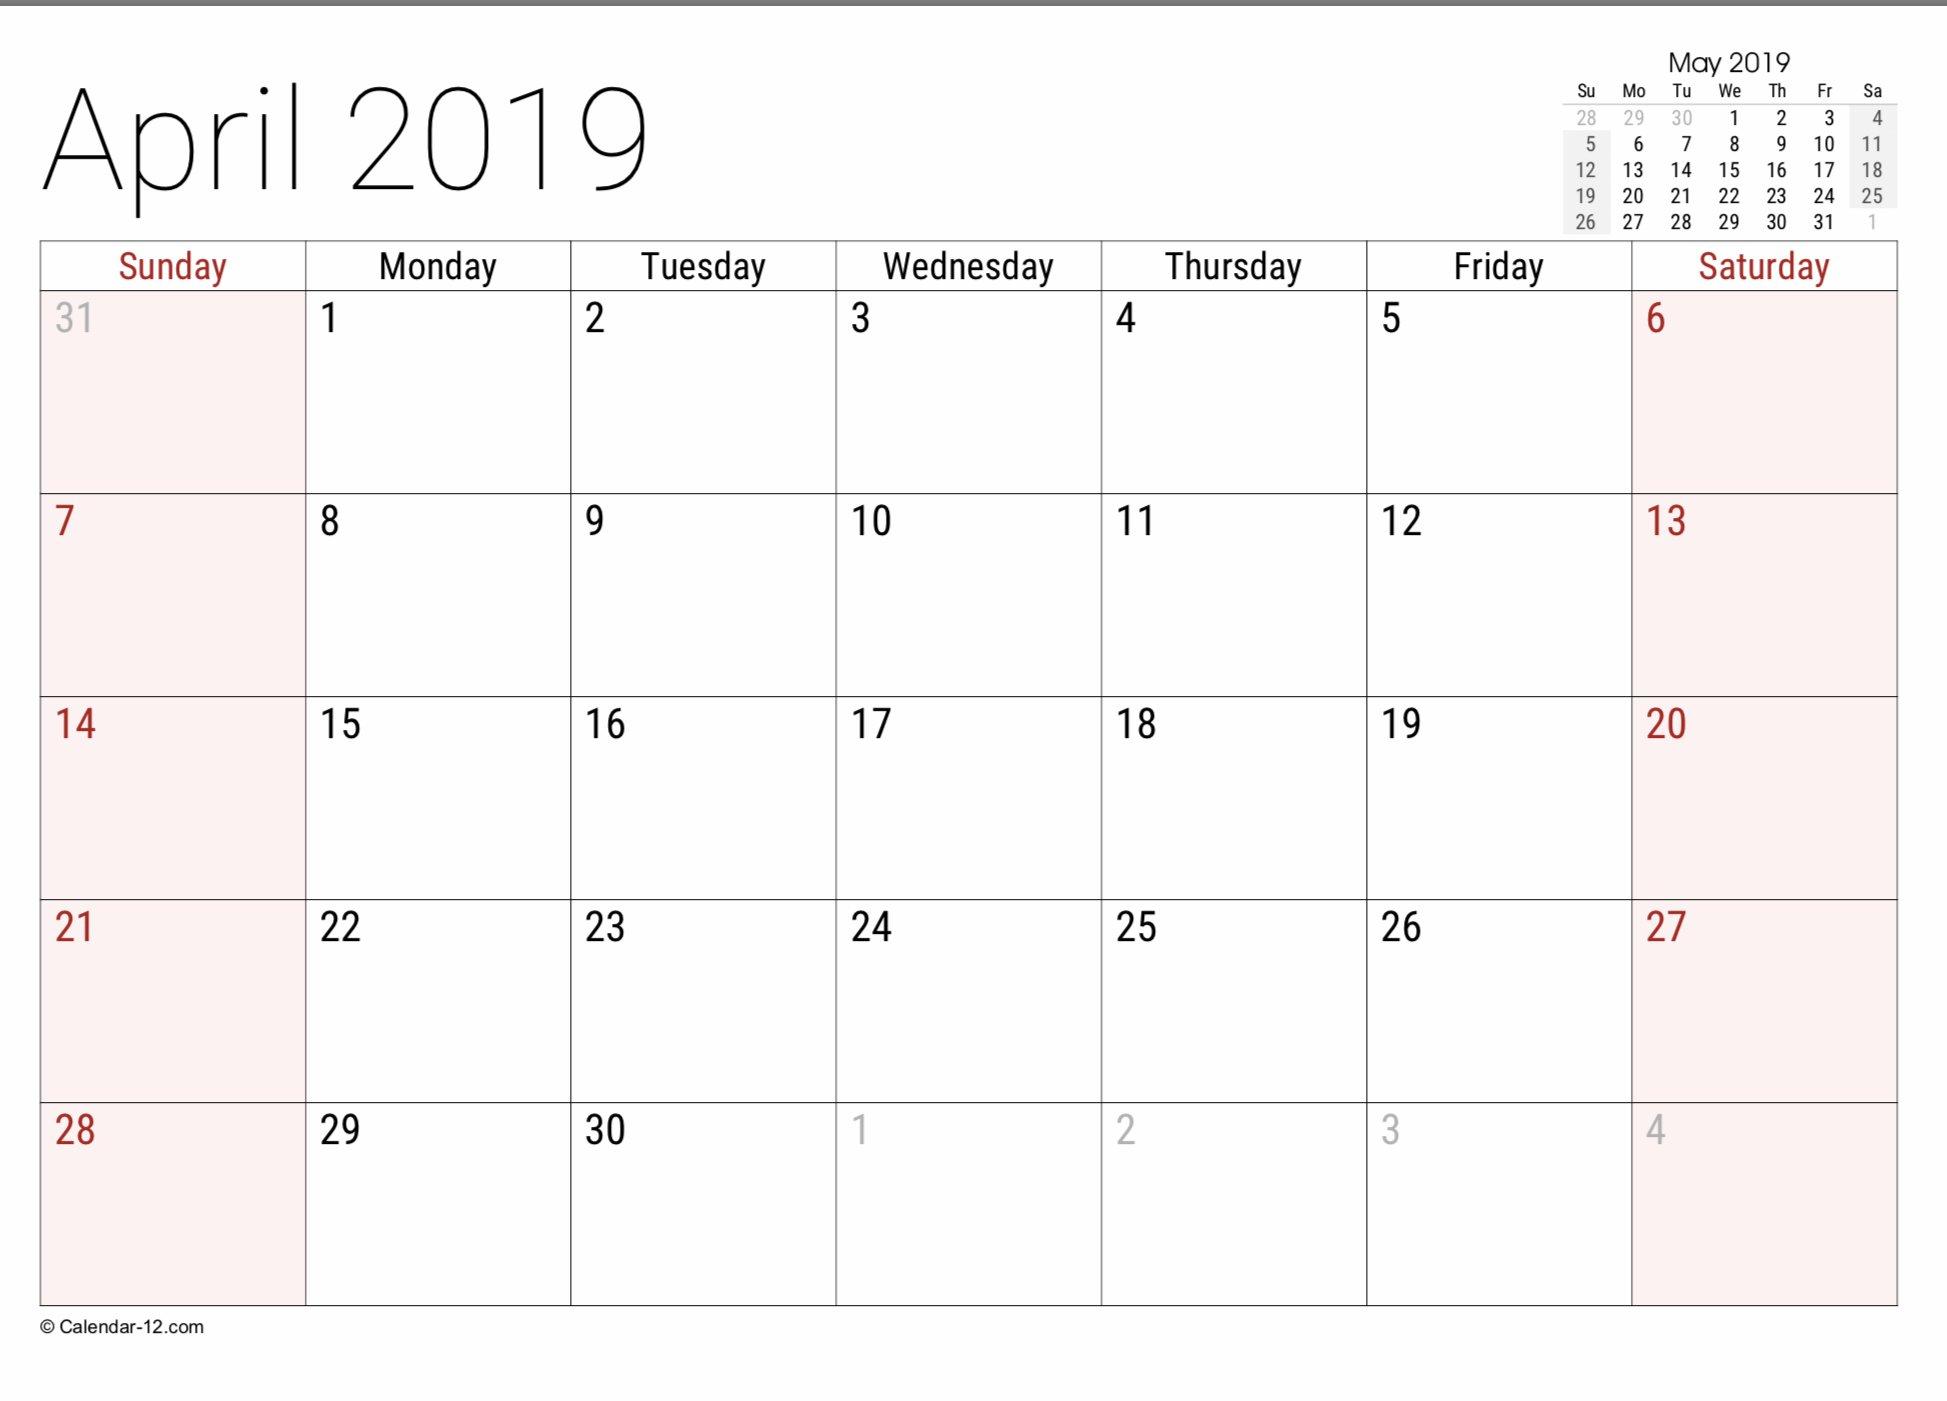 2019 Free Printable Calendar Templates - A Mother's Random Free 8 1/2 By 11 Blank Calendar